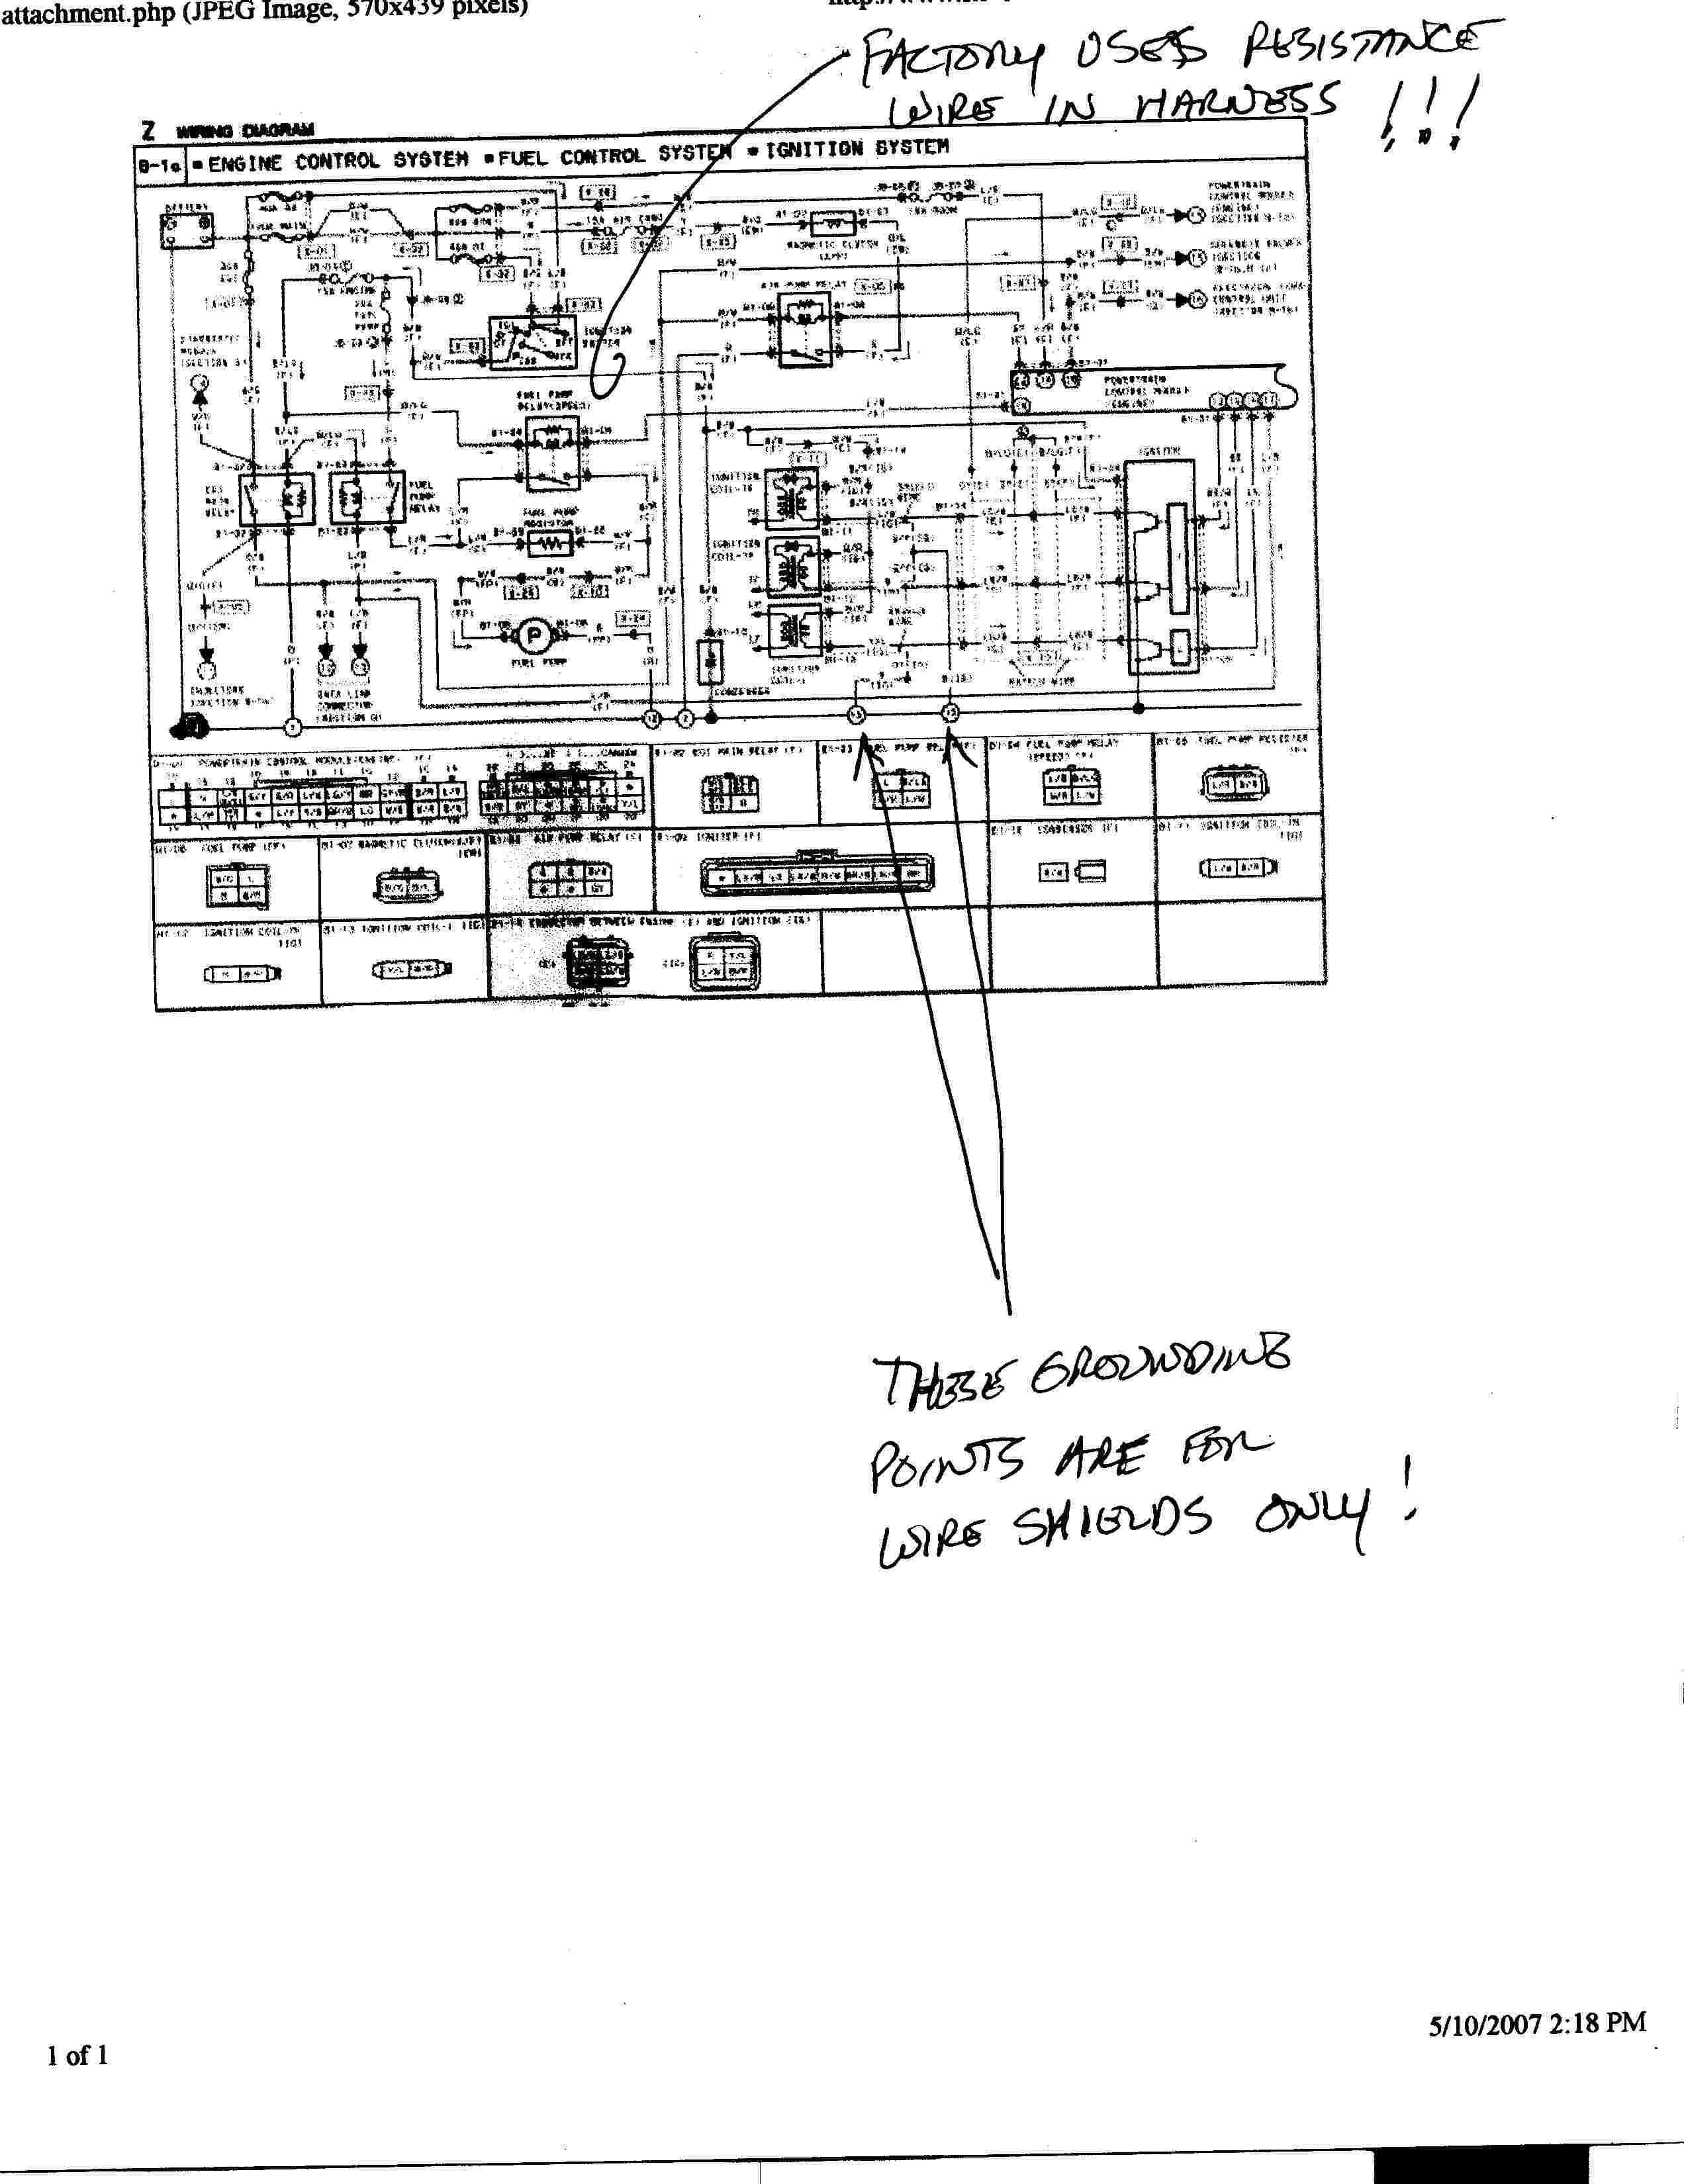 2002 Dodge Ram 1500 Heater Diagram Review Ebooks